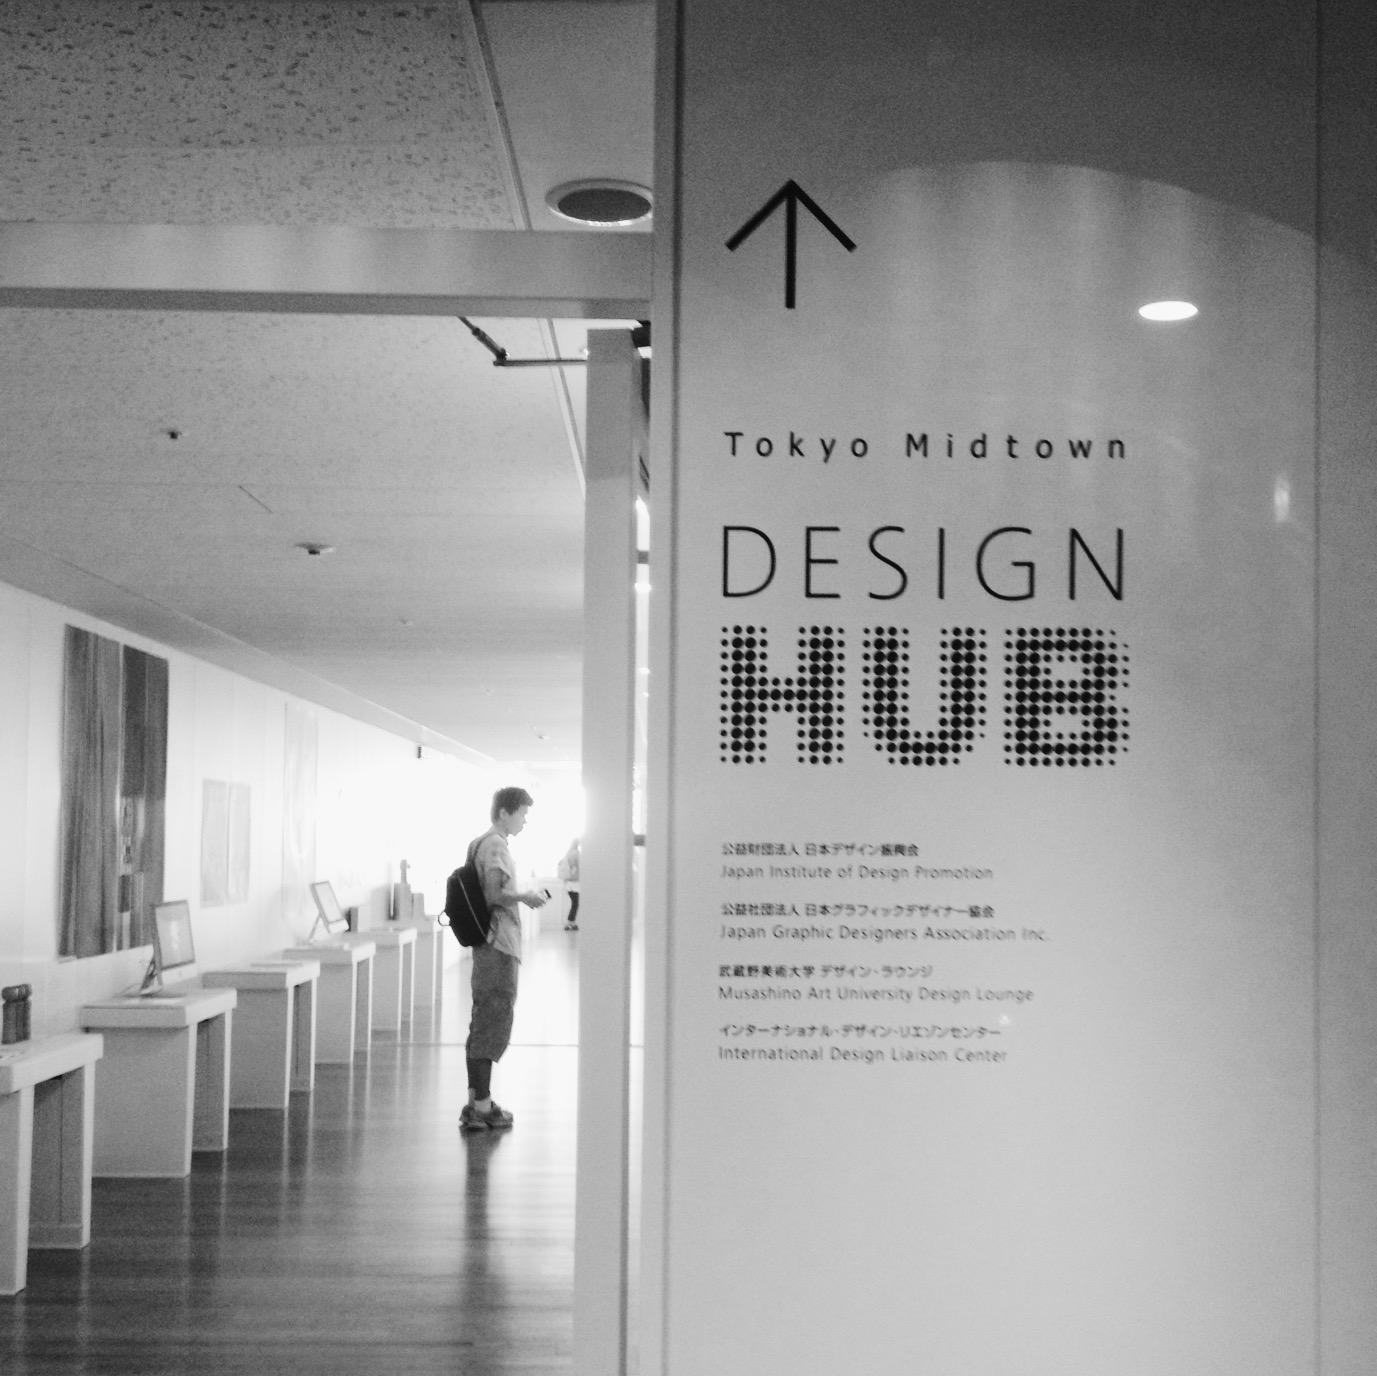 Design hub inside Tokyo Midtown